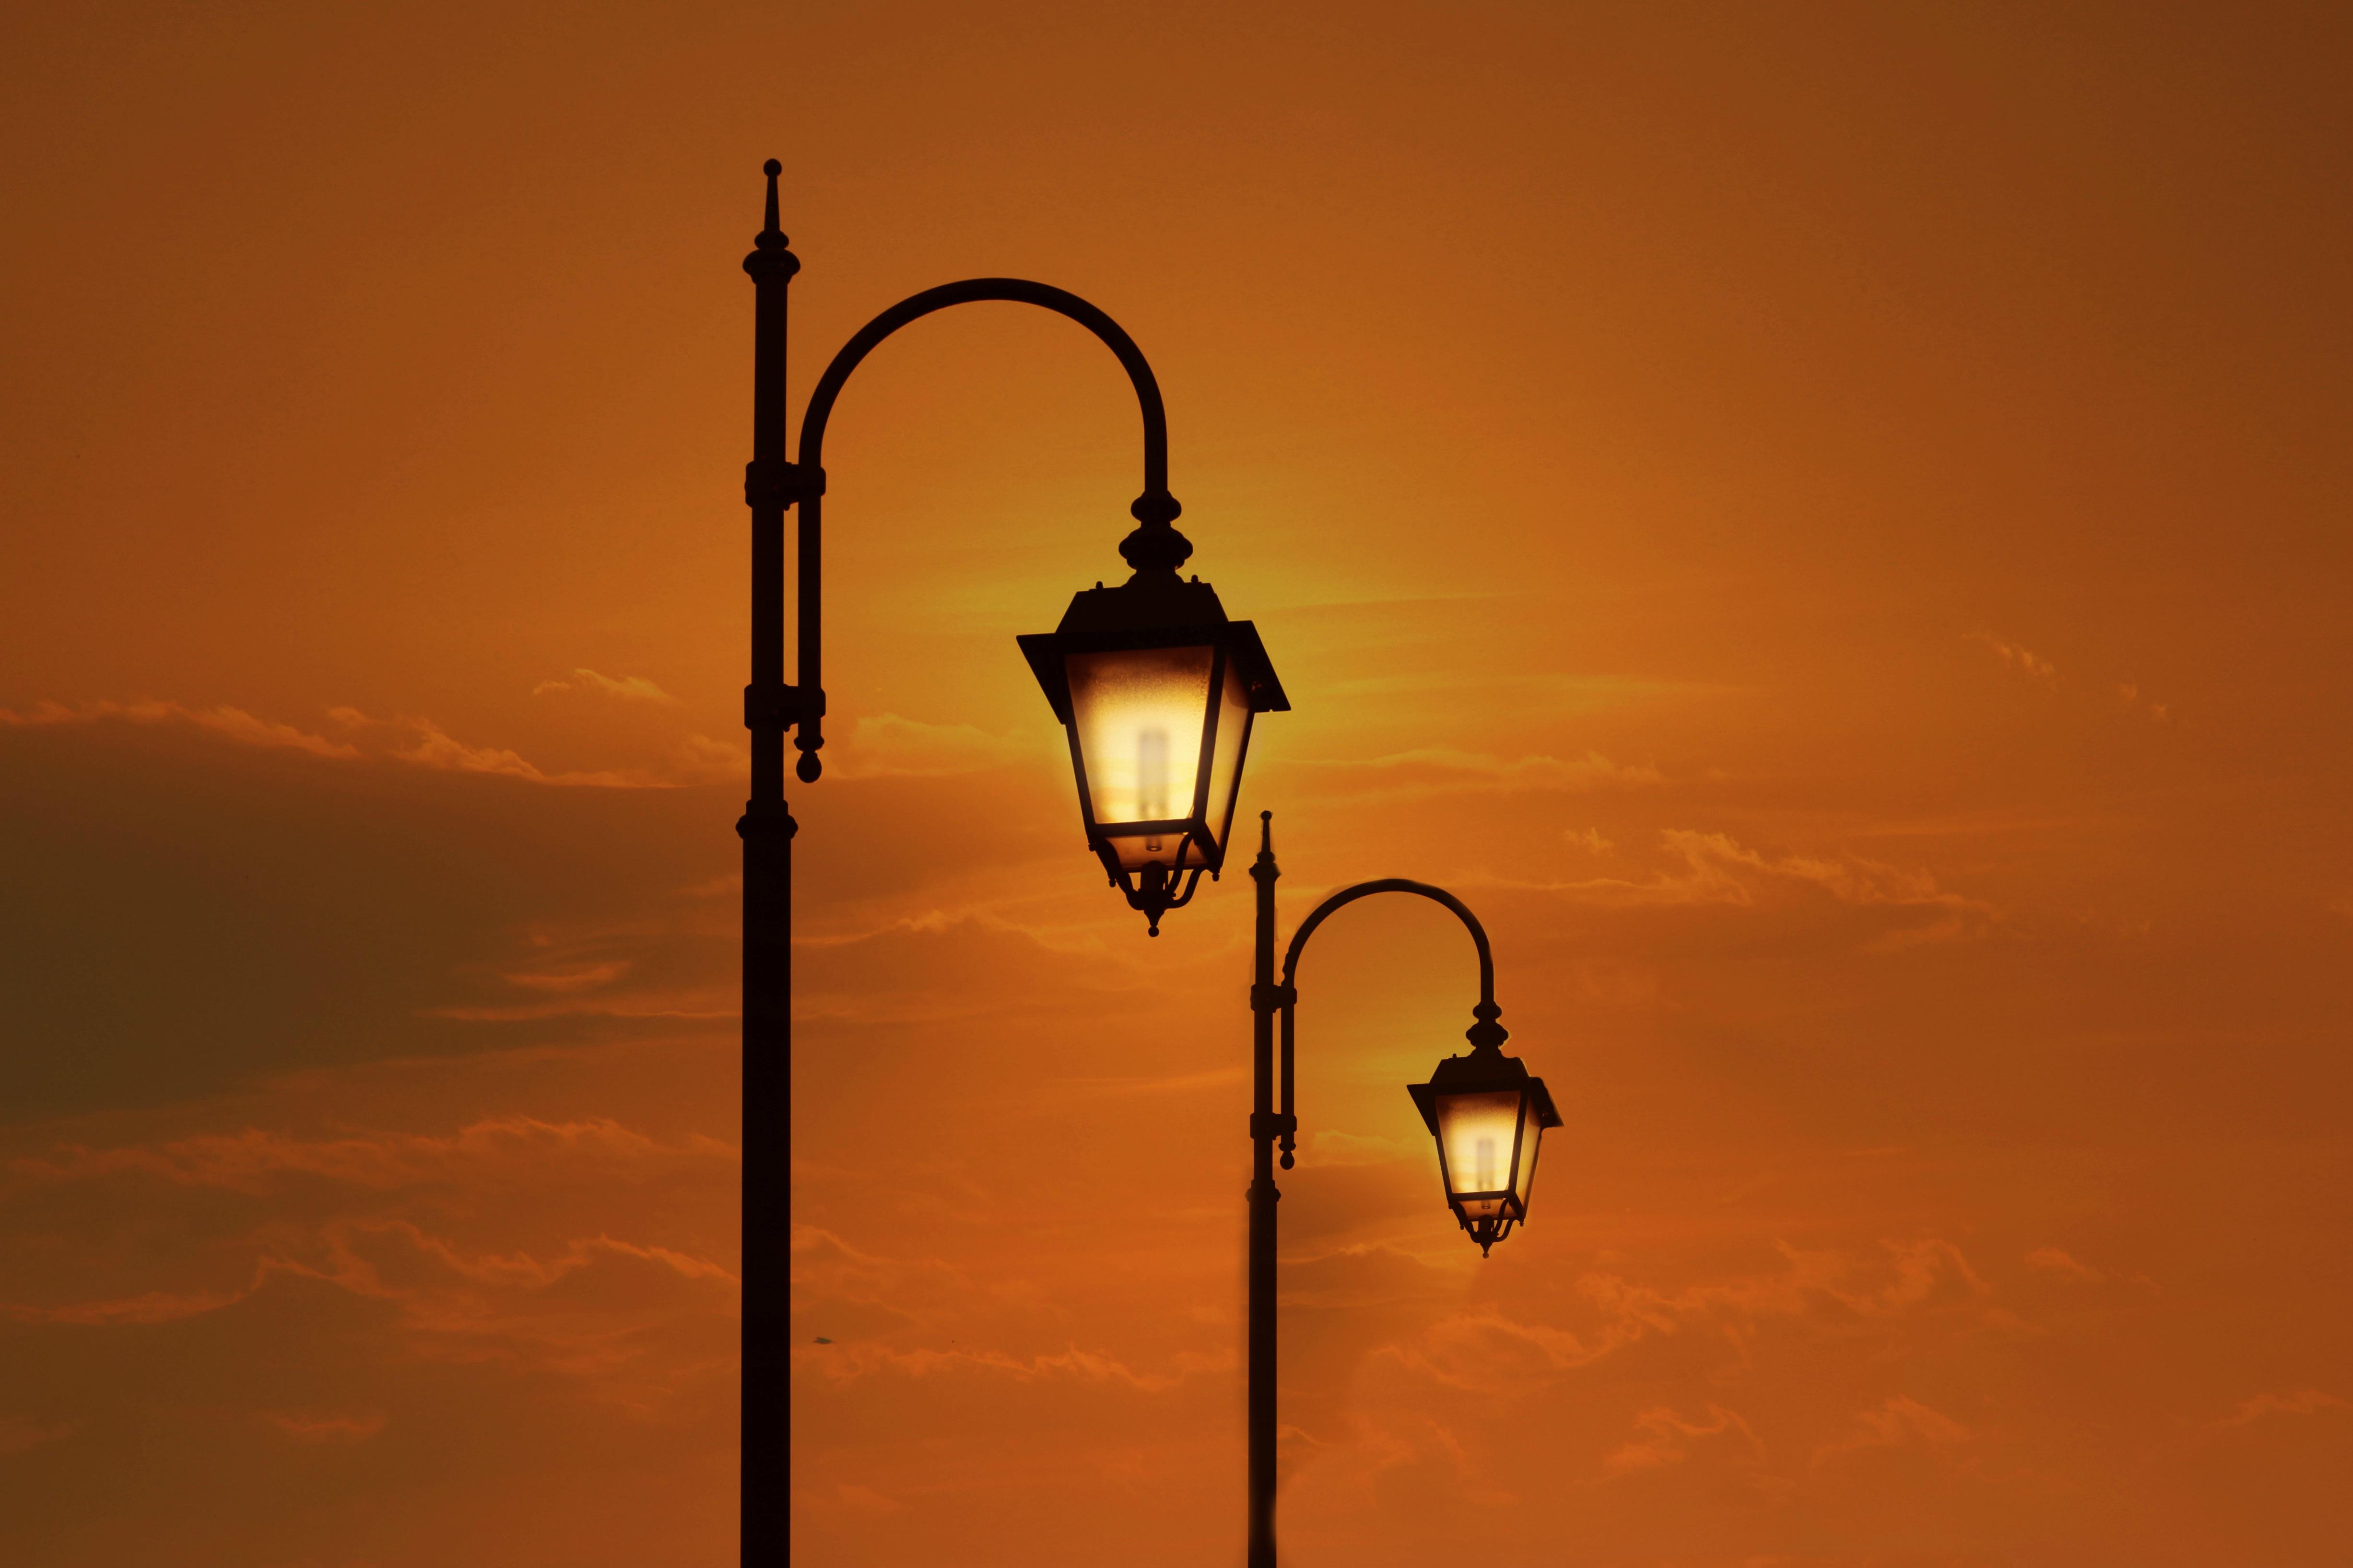 Photos Two Sunrises and sunsets Street lights 2 sunrise and sunset